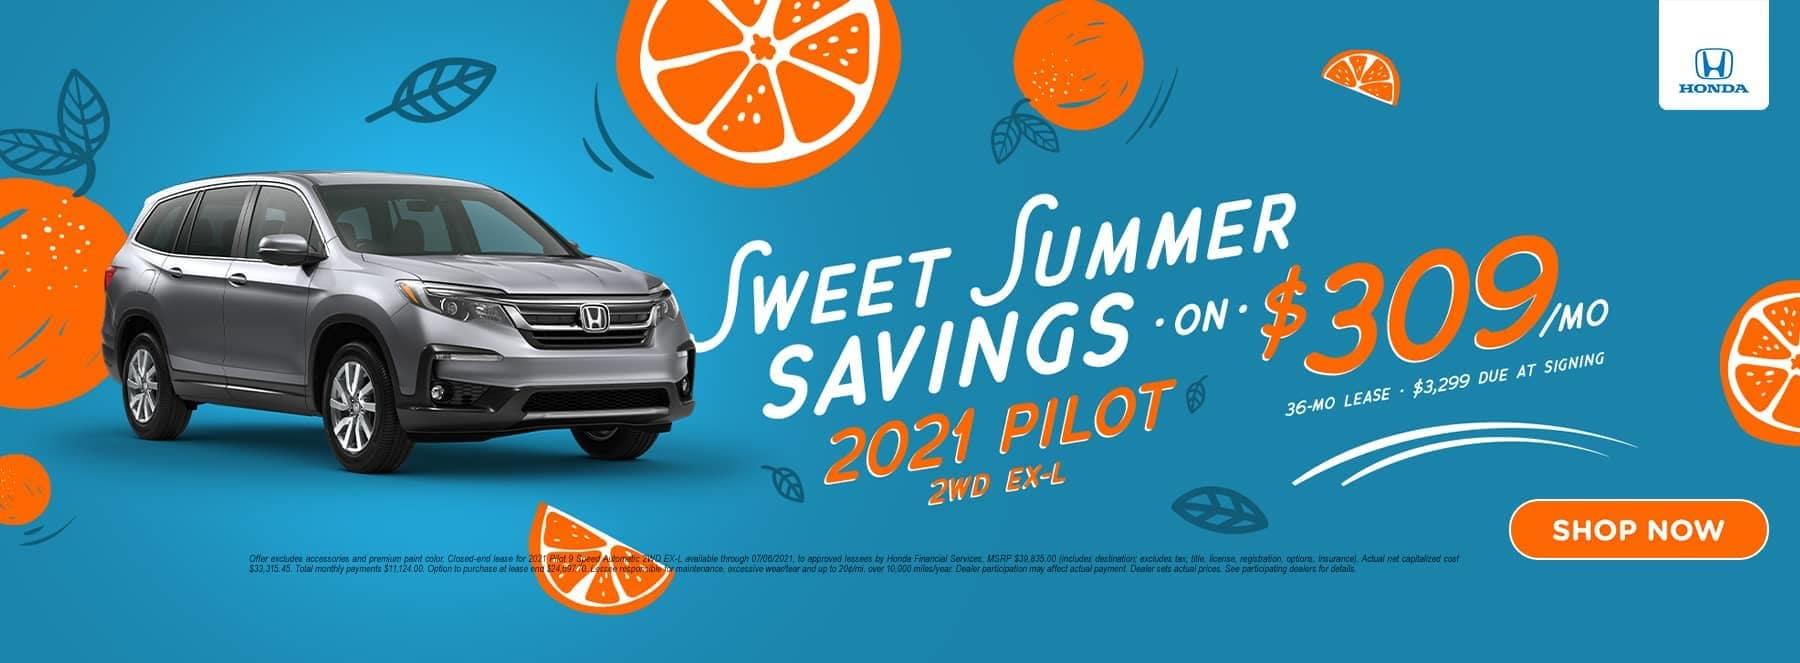 Sweet Summer Savings 2021 Pilot 2WD EX-L